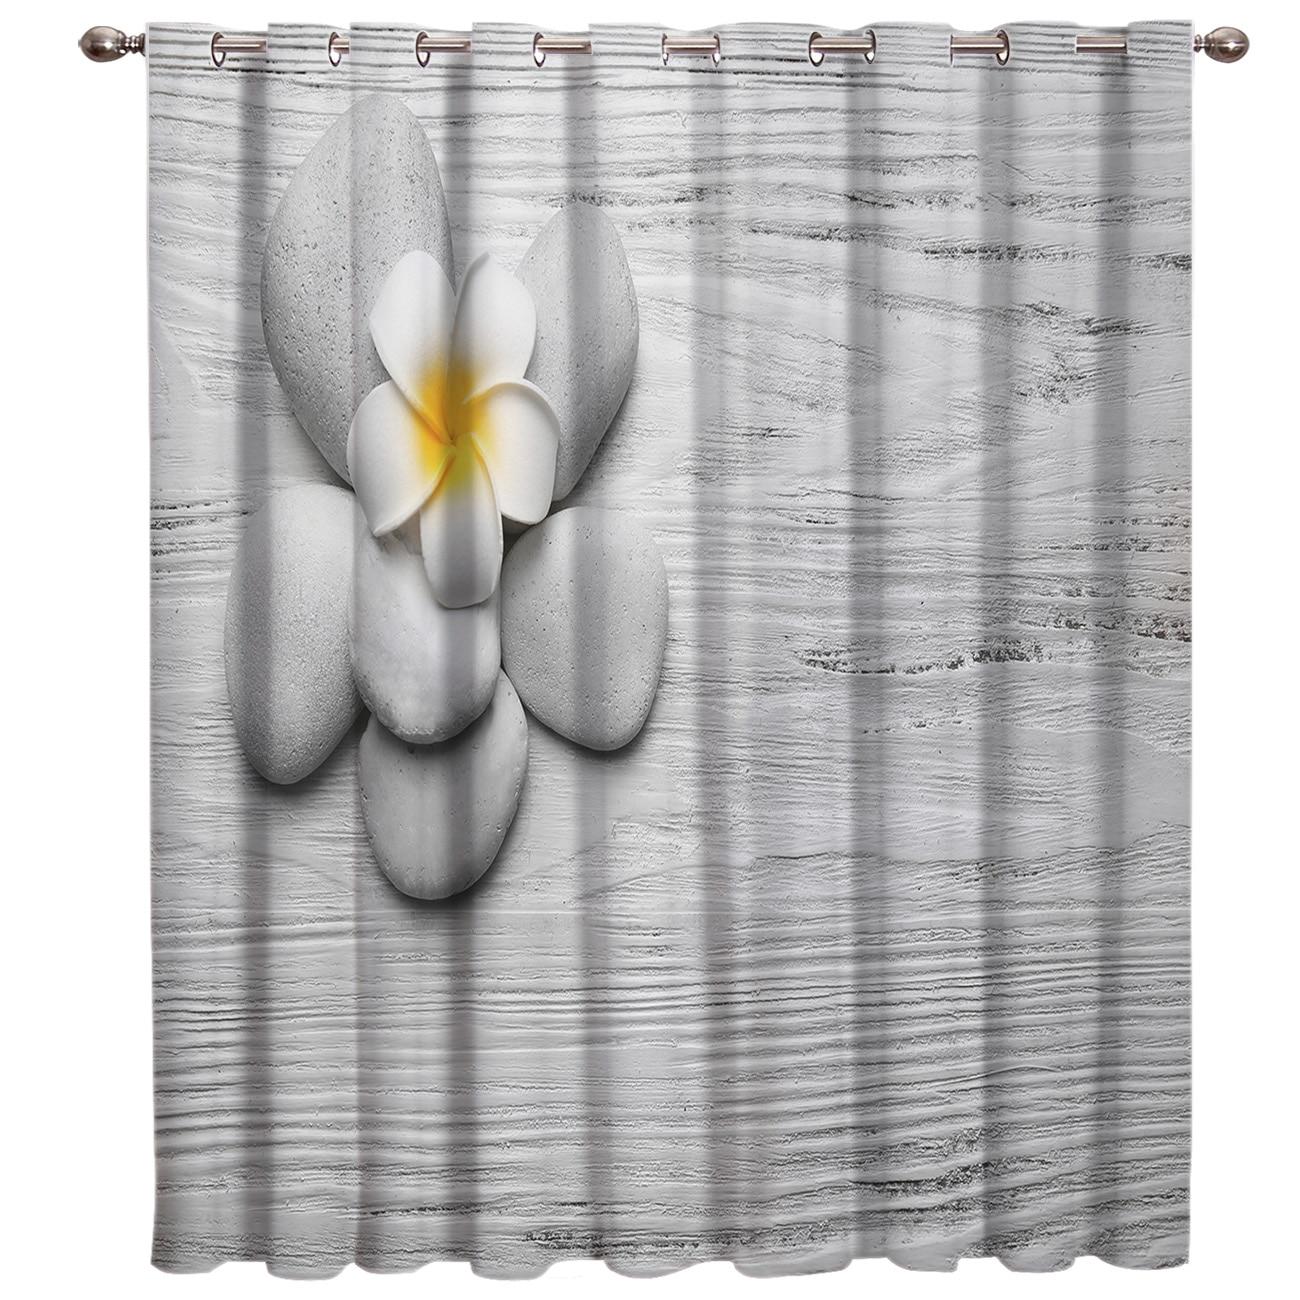 Graystone Zen Flower Art Window Curtains Dark Curtain Rod Bathroom Fabric Print Decor Window Treatment Ideas Window Treatment